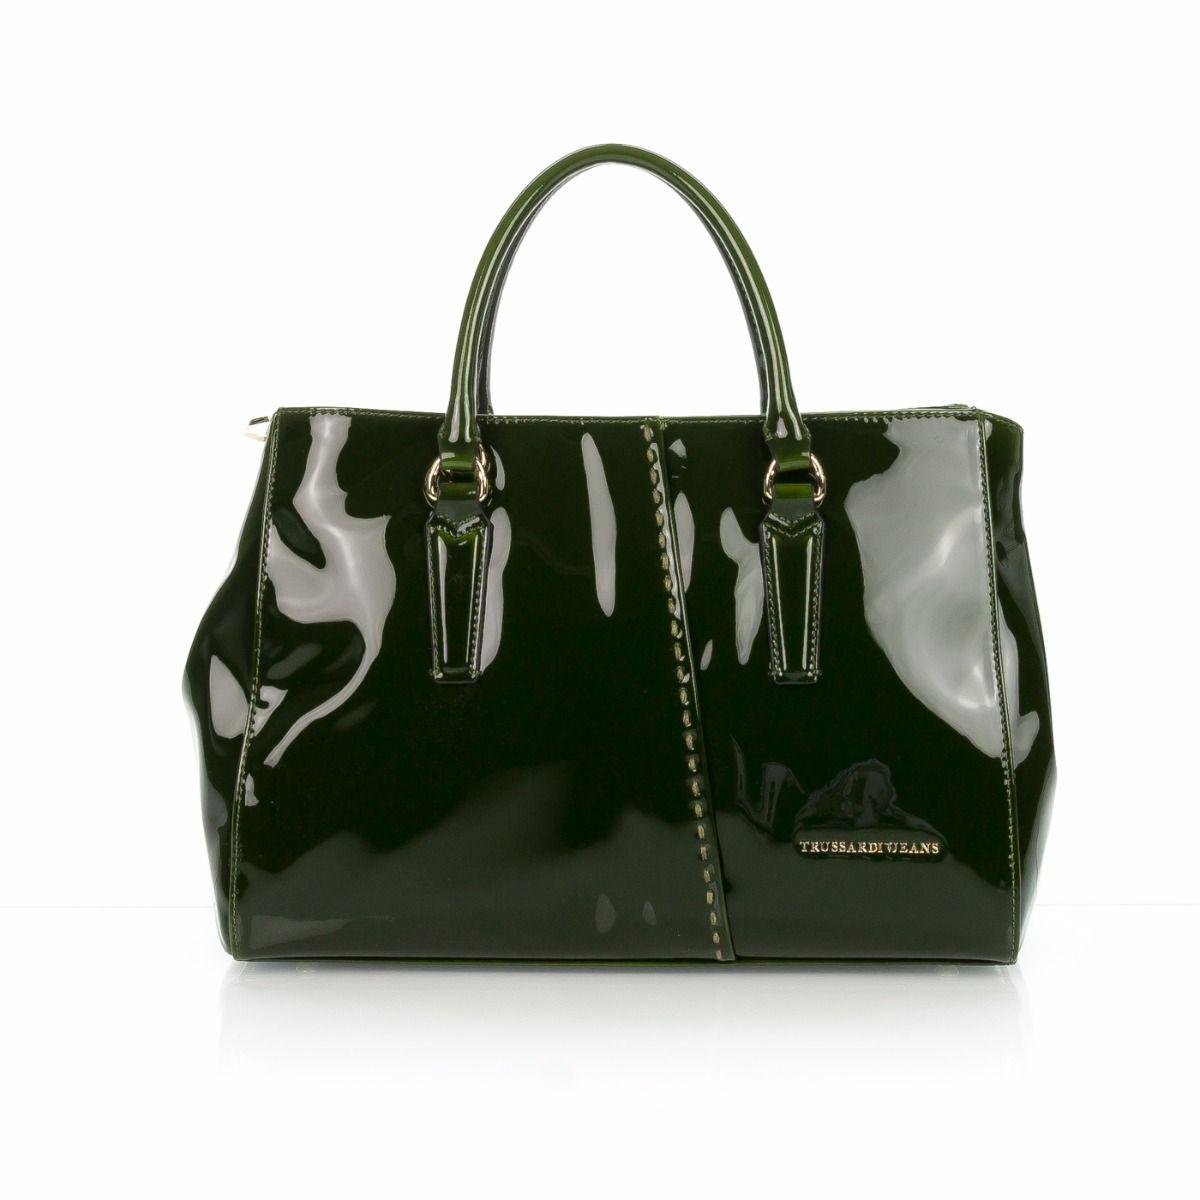 874e36f0b5bb77 Borsa a mano donna TRUSSARDI JEANS 75B00119 G150 LAYLA in vernice verde  |Spedizione gratuita|Shop online|Shoe Center